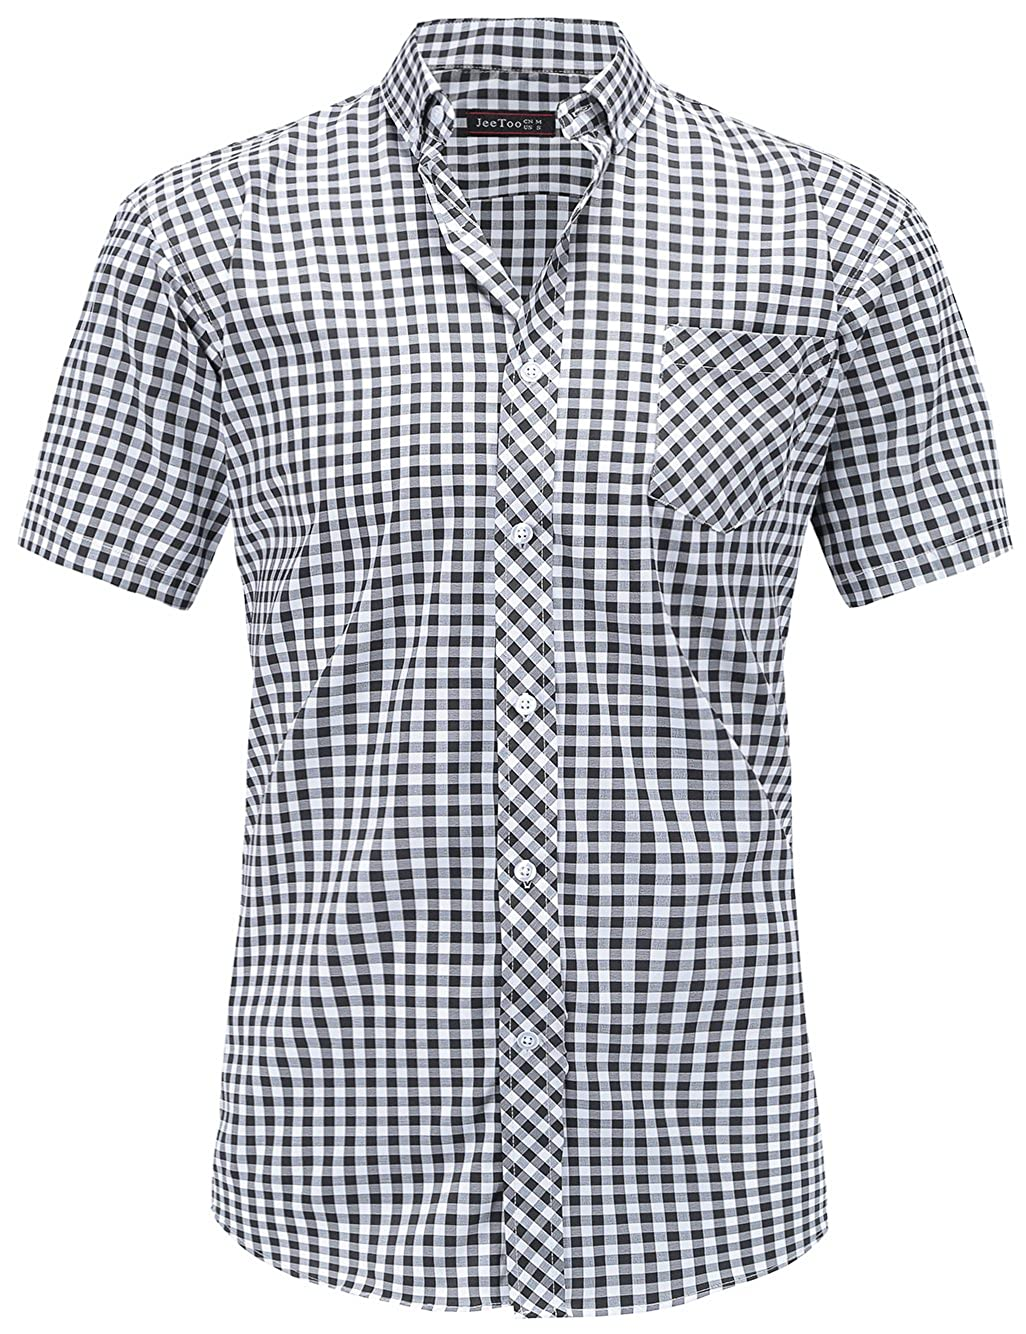 JEETOO Camisa Casual a Cuadros Manga Corta para Hombre